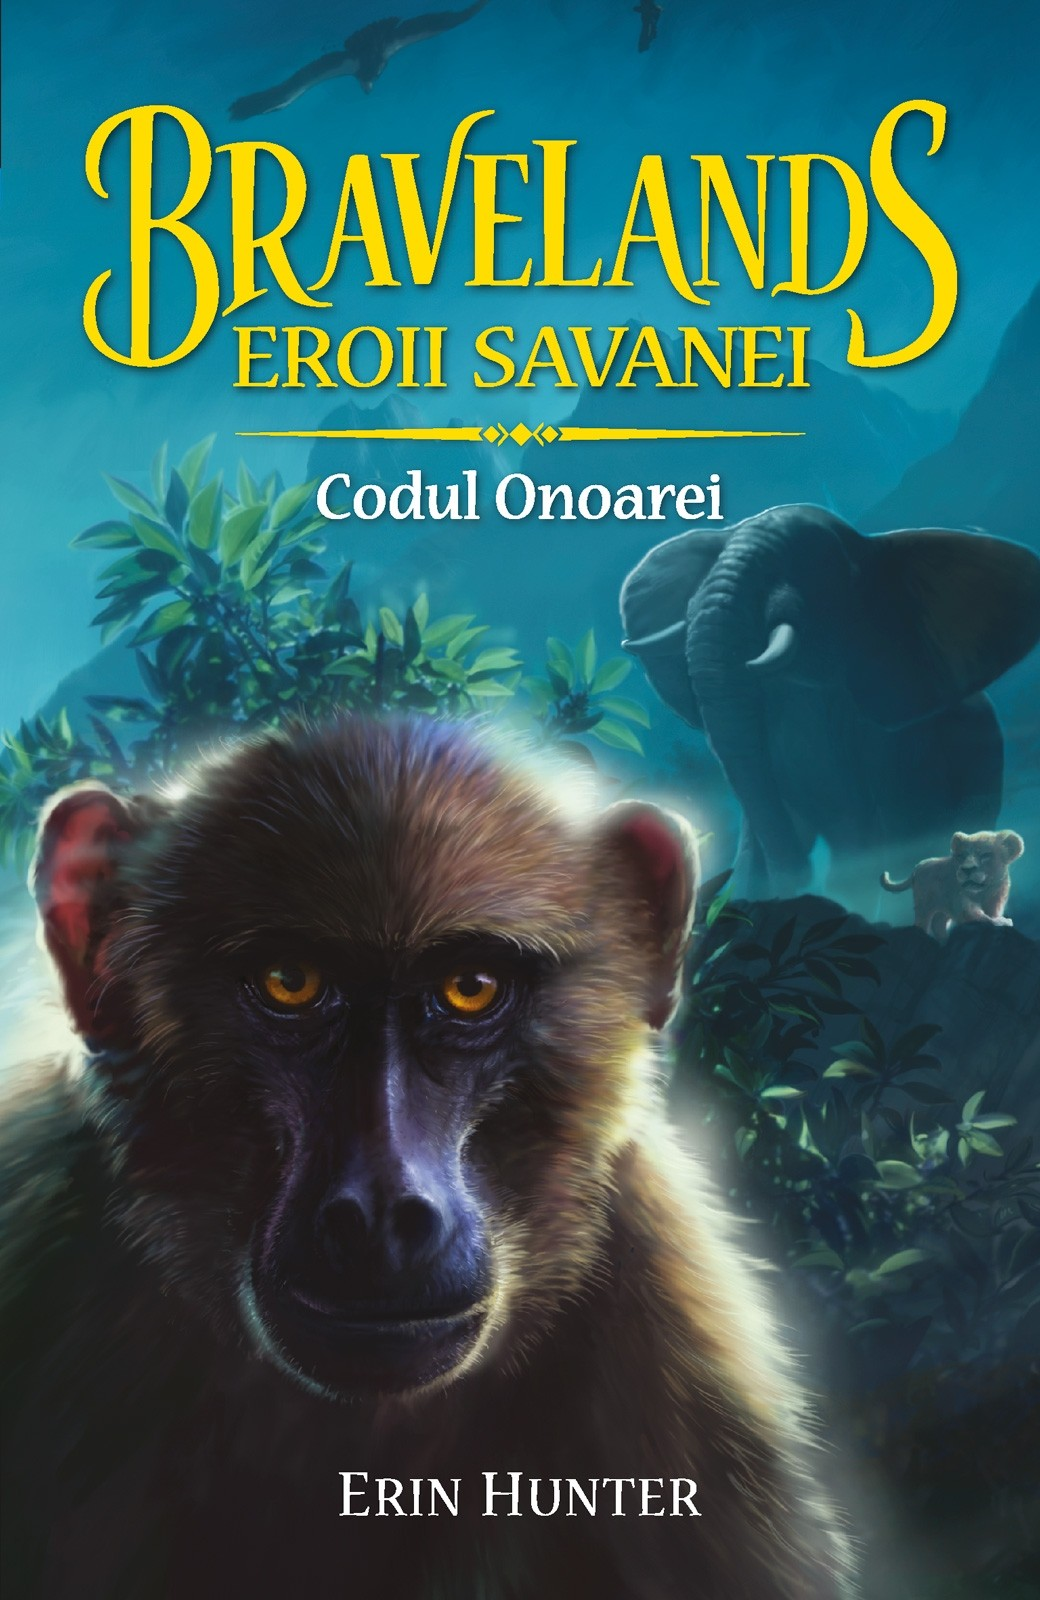 Bravelands - Eroii Savanei. Codul Onoarei | Erin Hunter